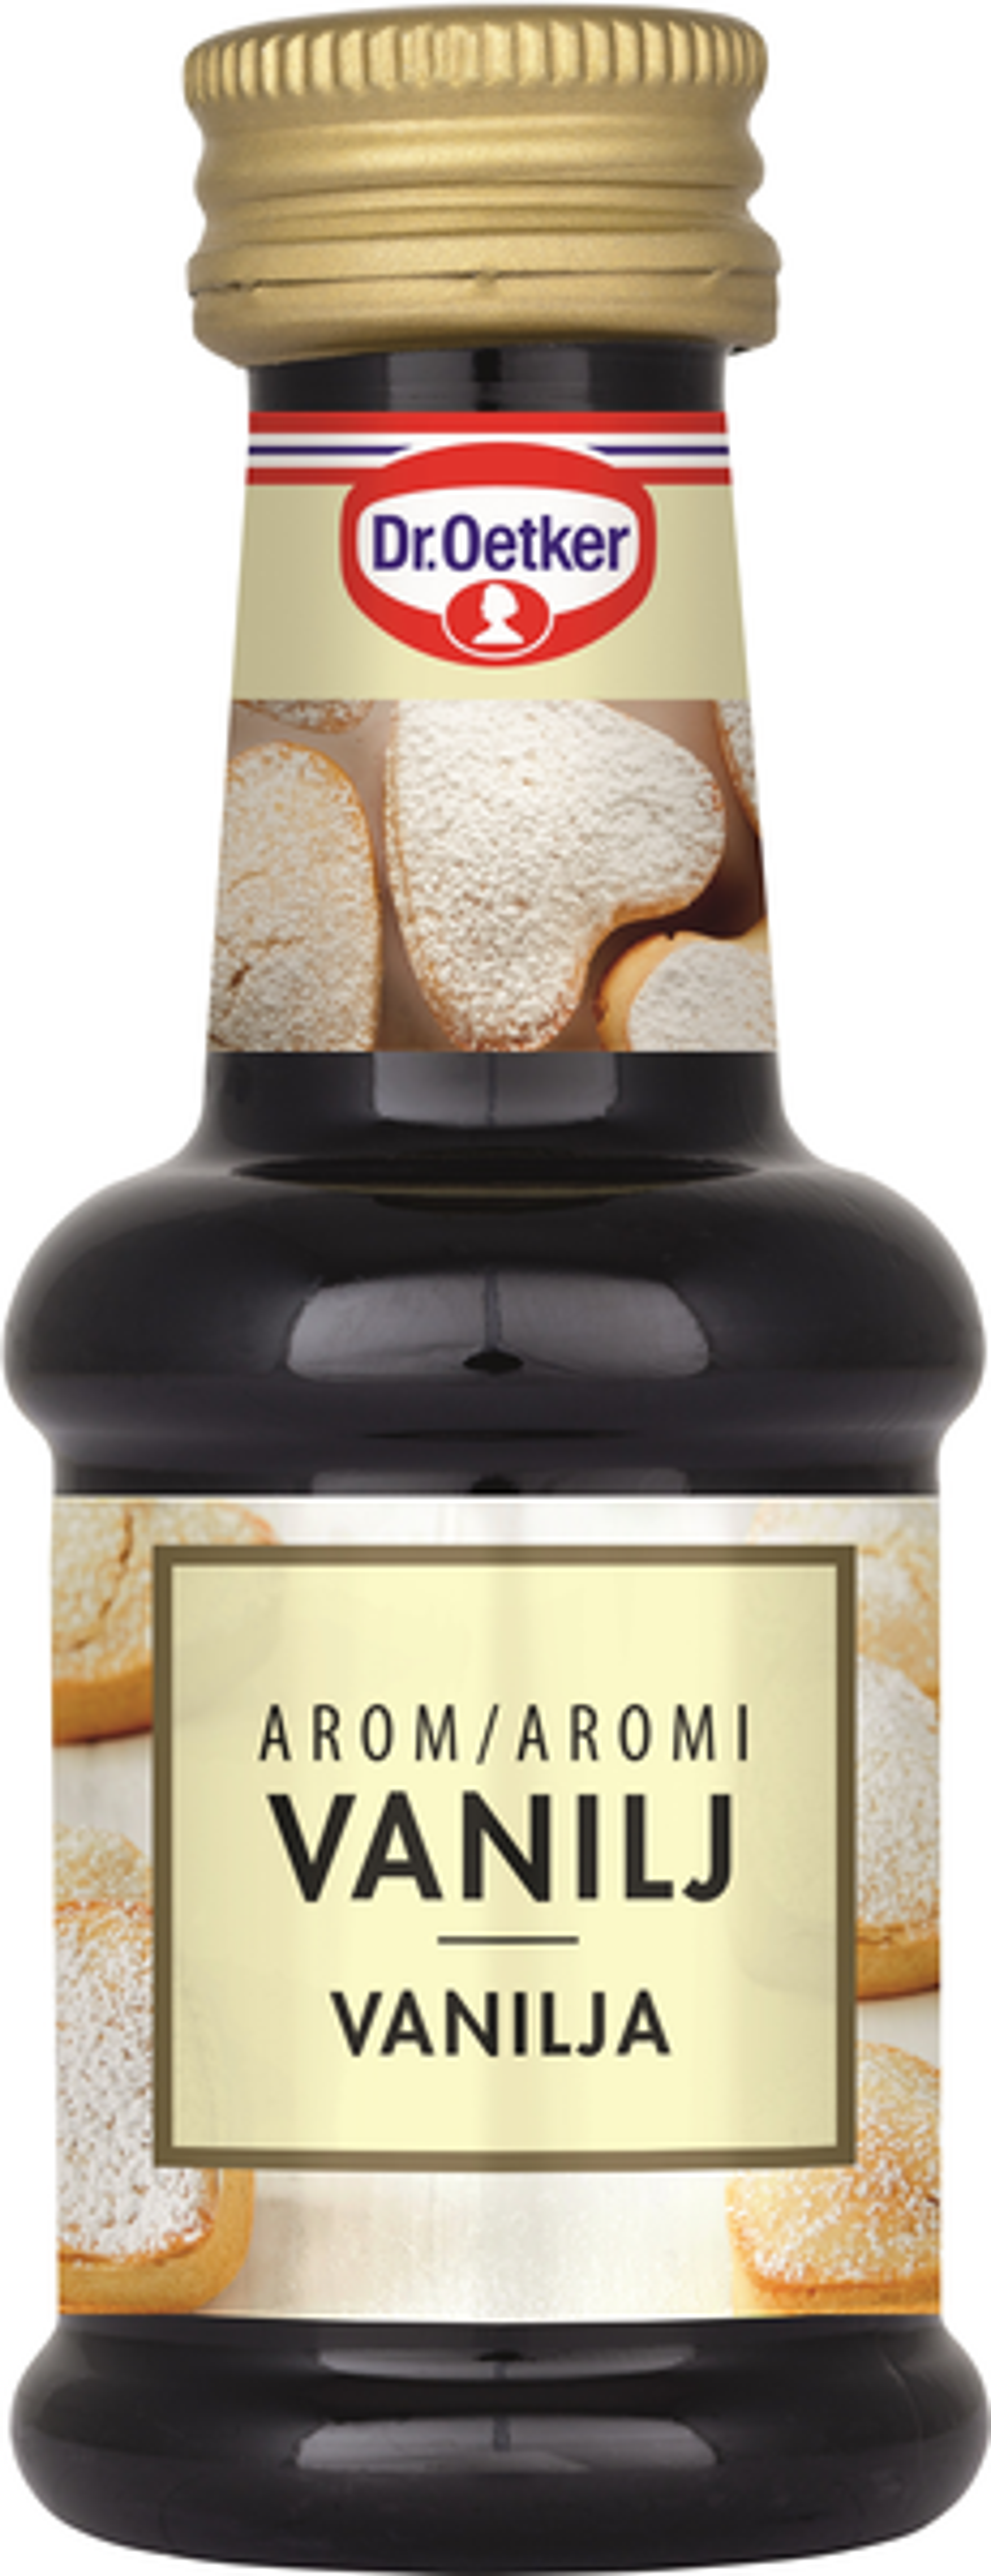 Vanilja aromi